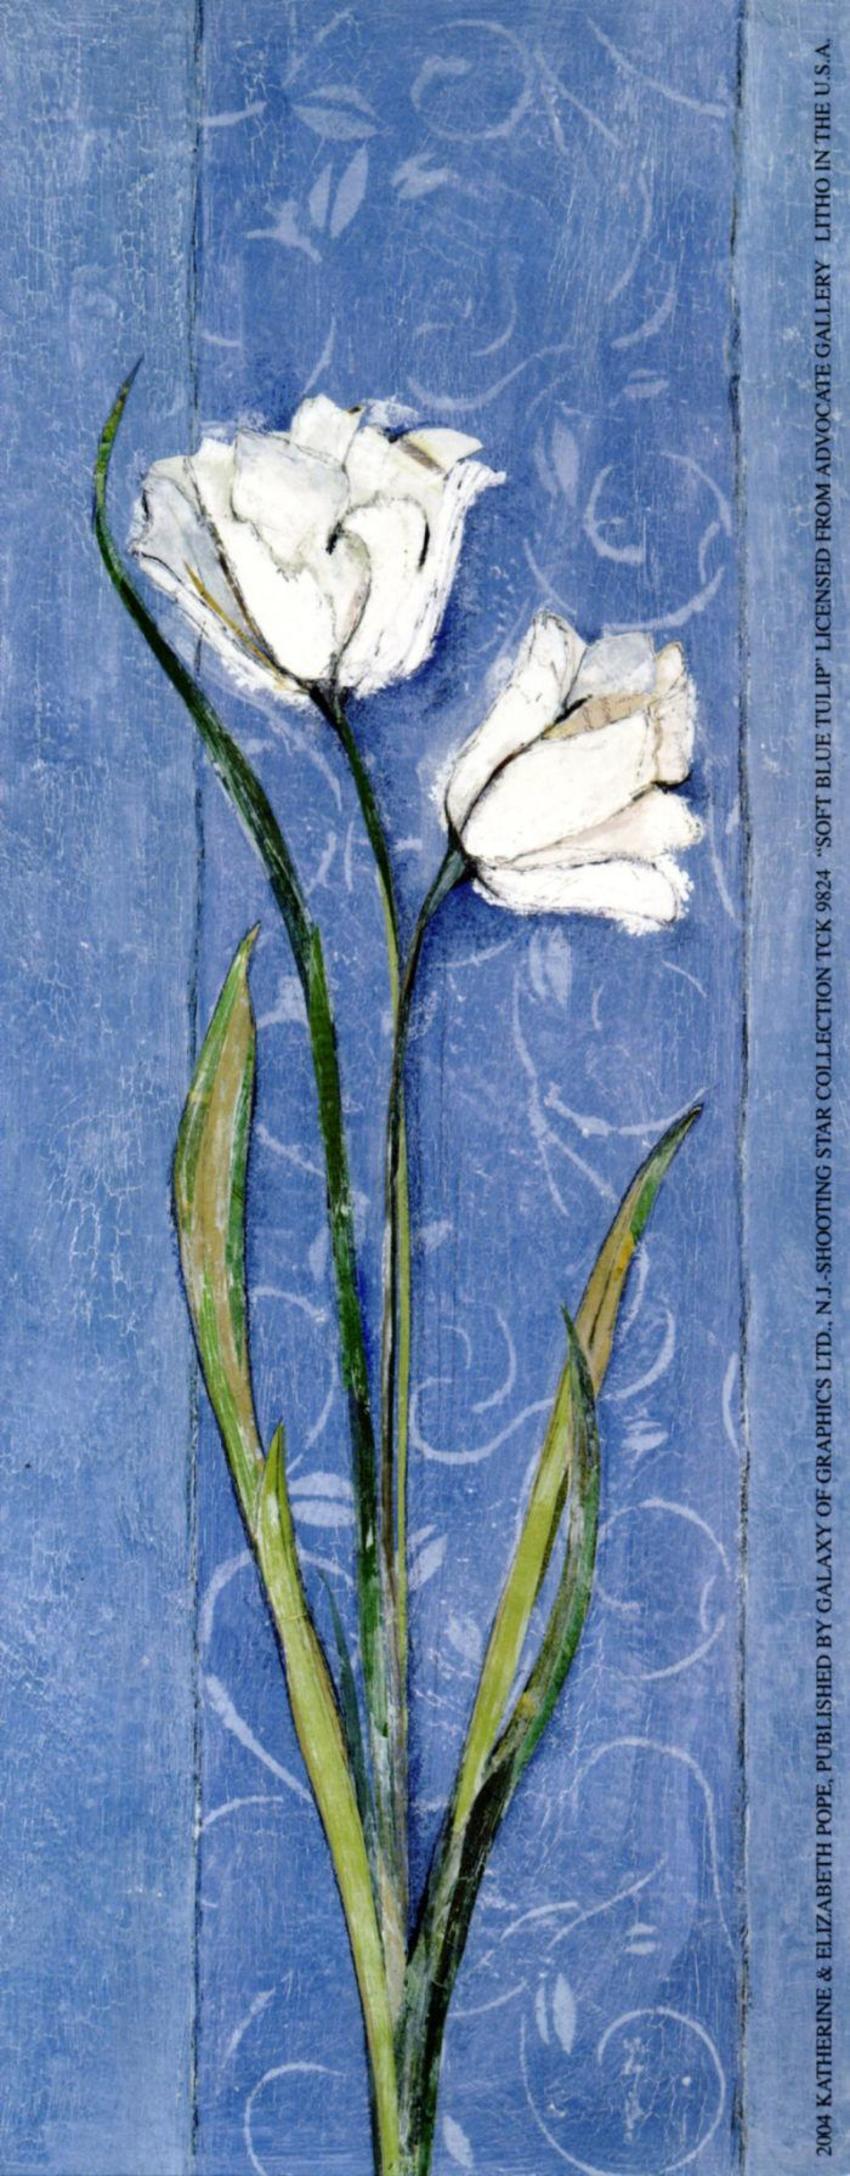 lily & tulip blue copy.jpg